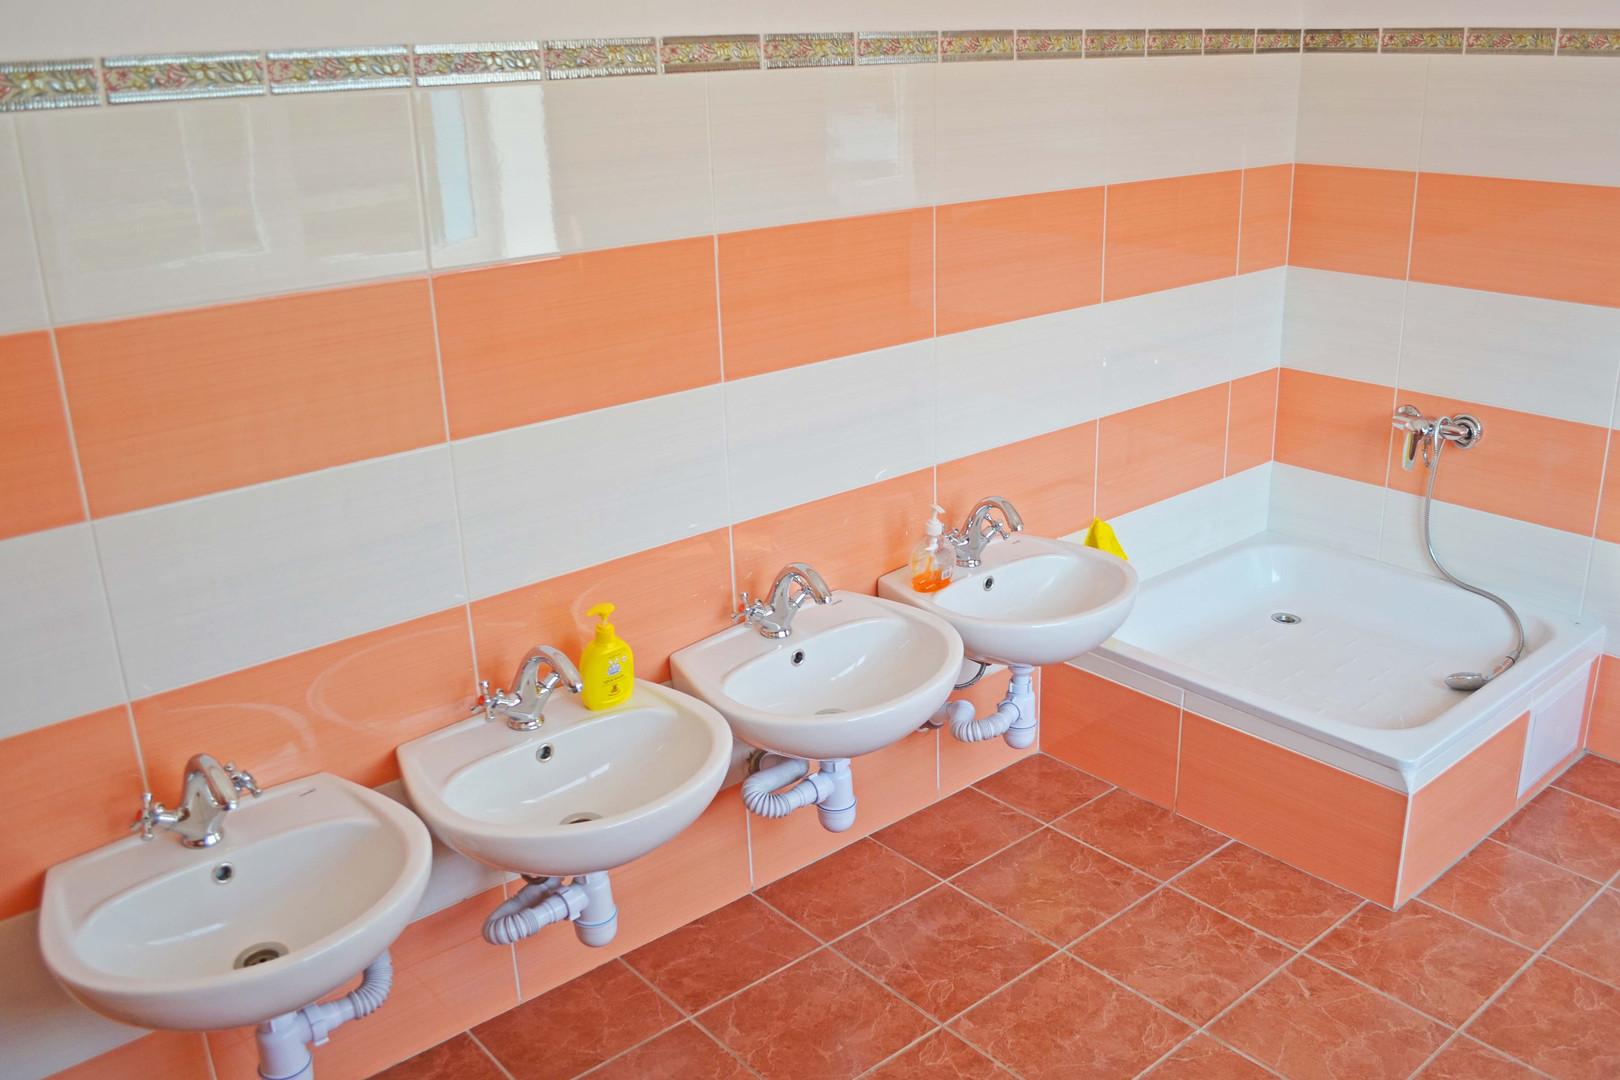 Туалетна кімната групи «Метелики» ДНЗ №1 «Дзвіночок» міста Сарни